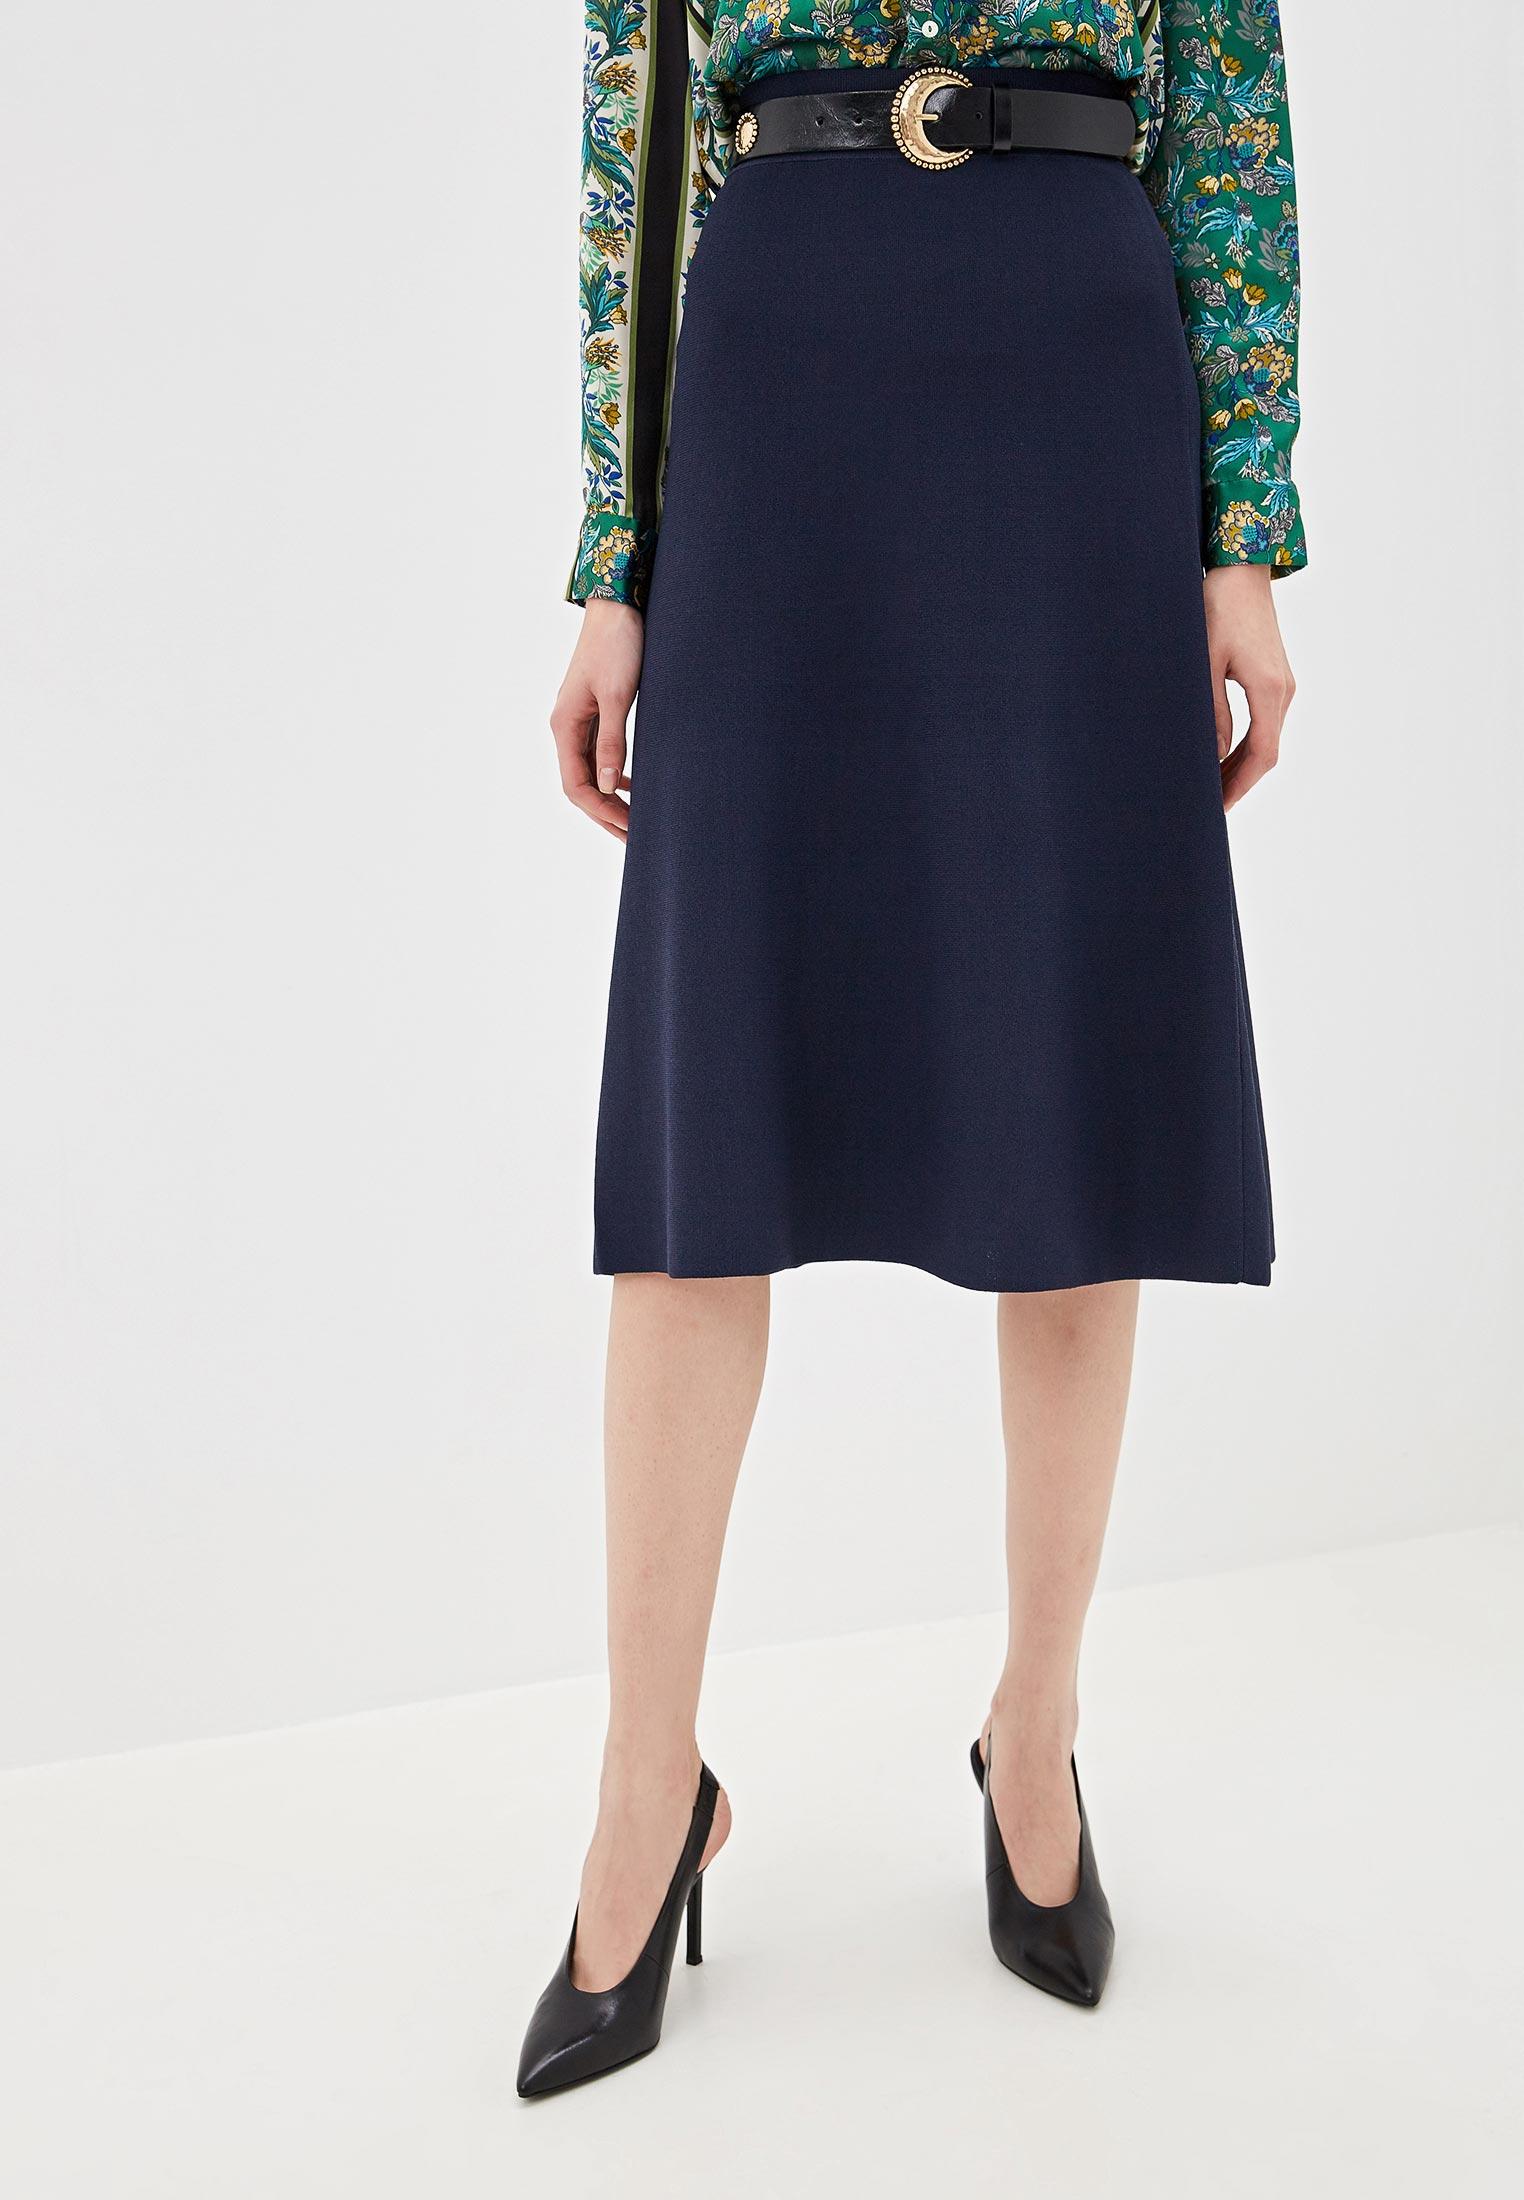 Широкая юбка Sela (Сэла) SKsw-118/1229-9331